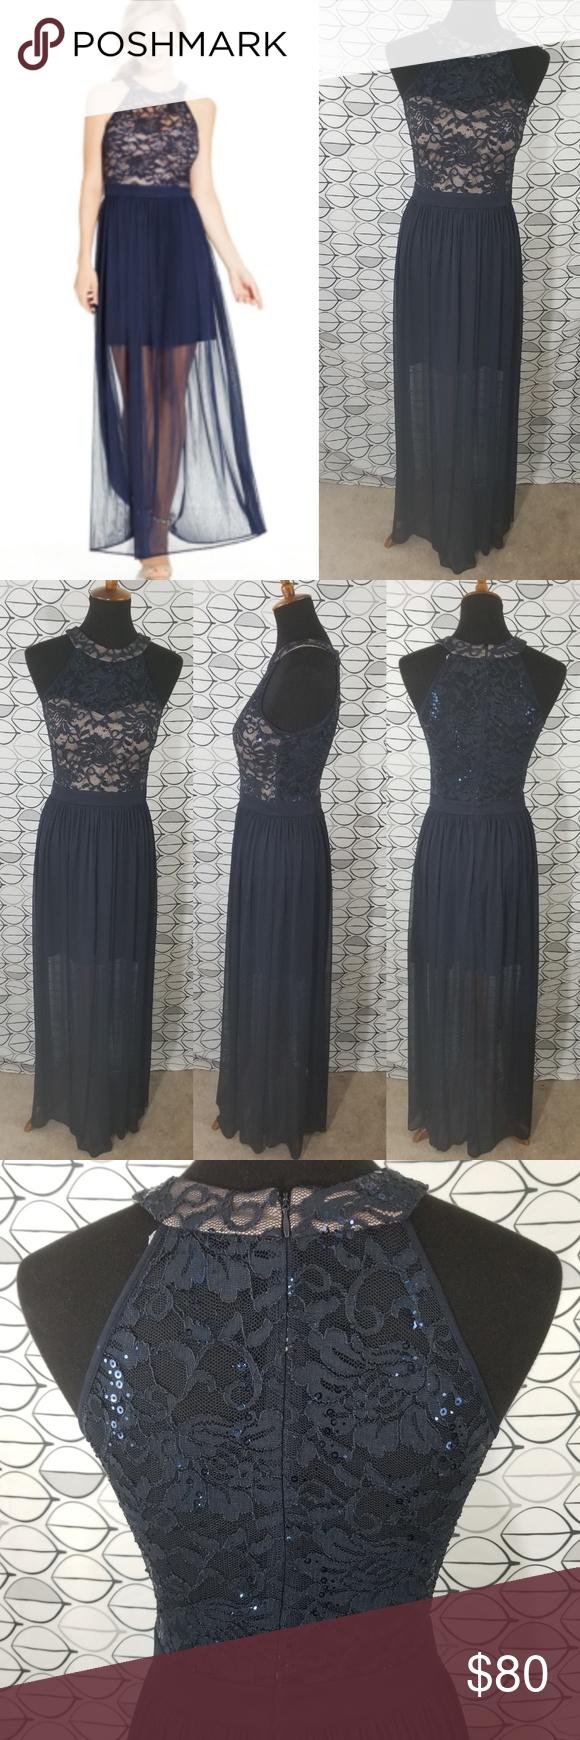 23+ Blue illusion black lace dress ideas